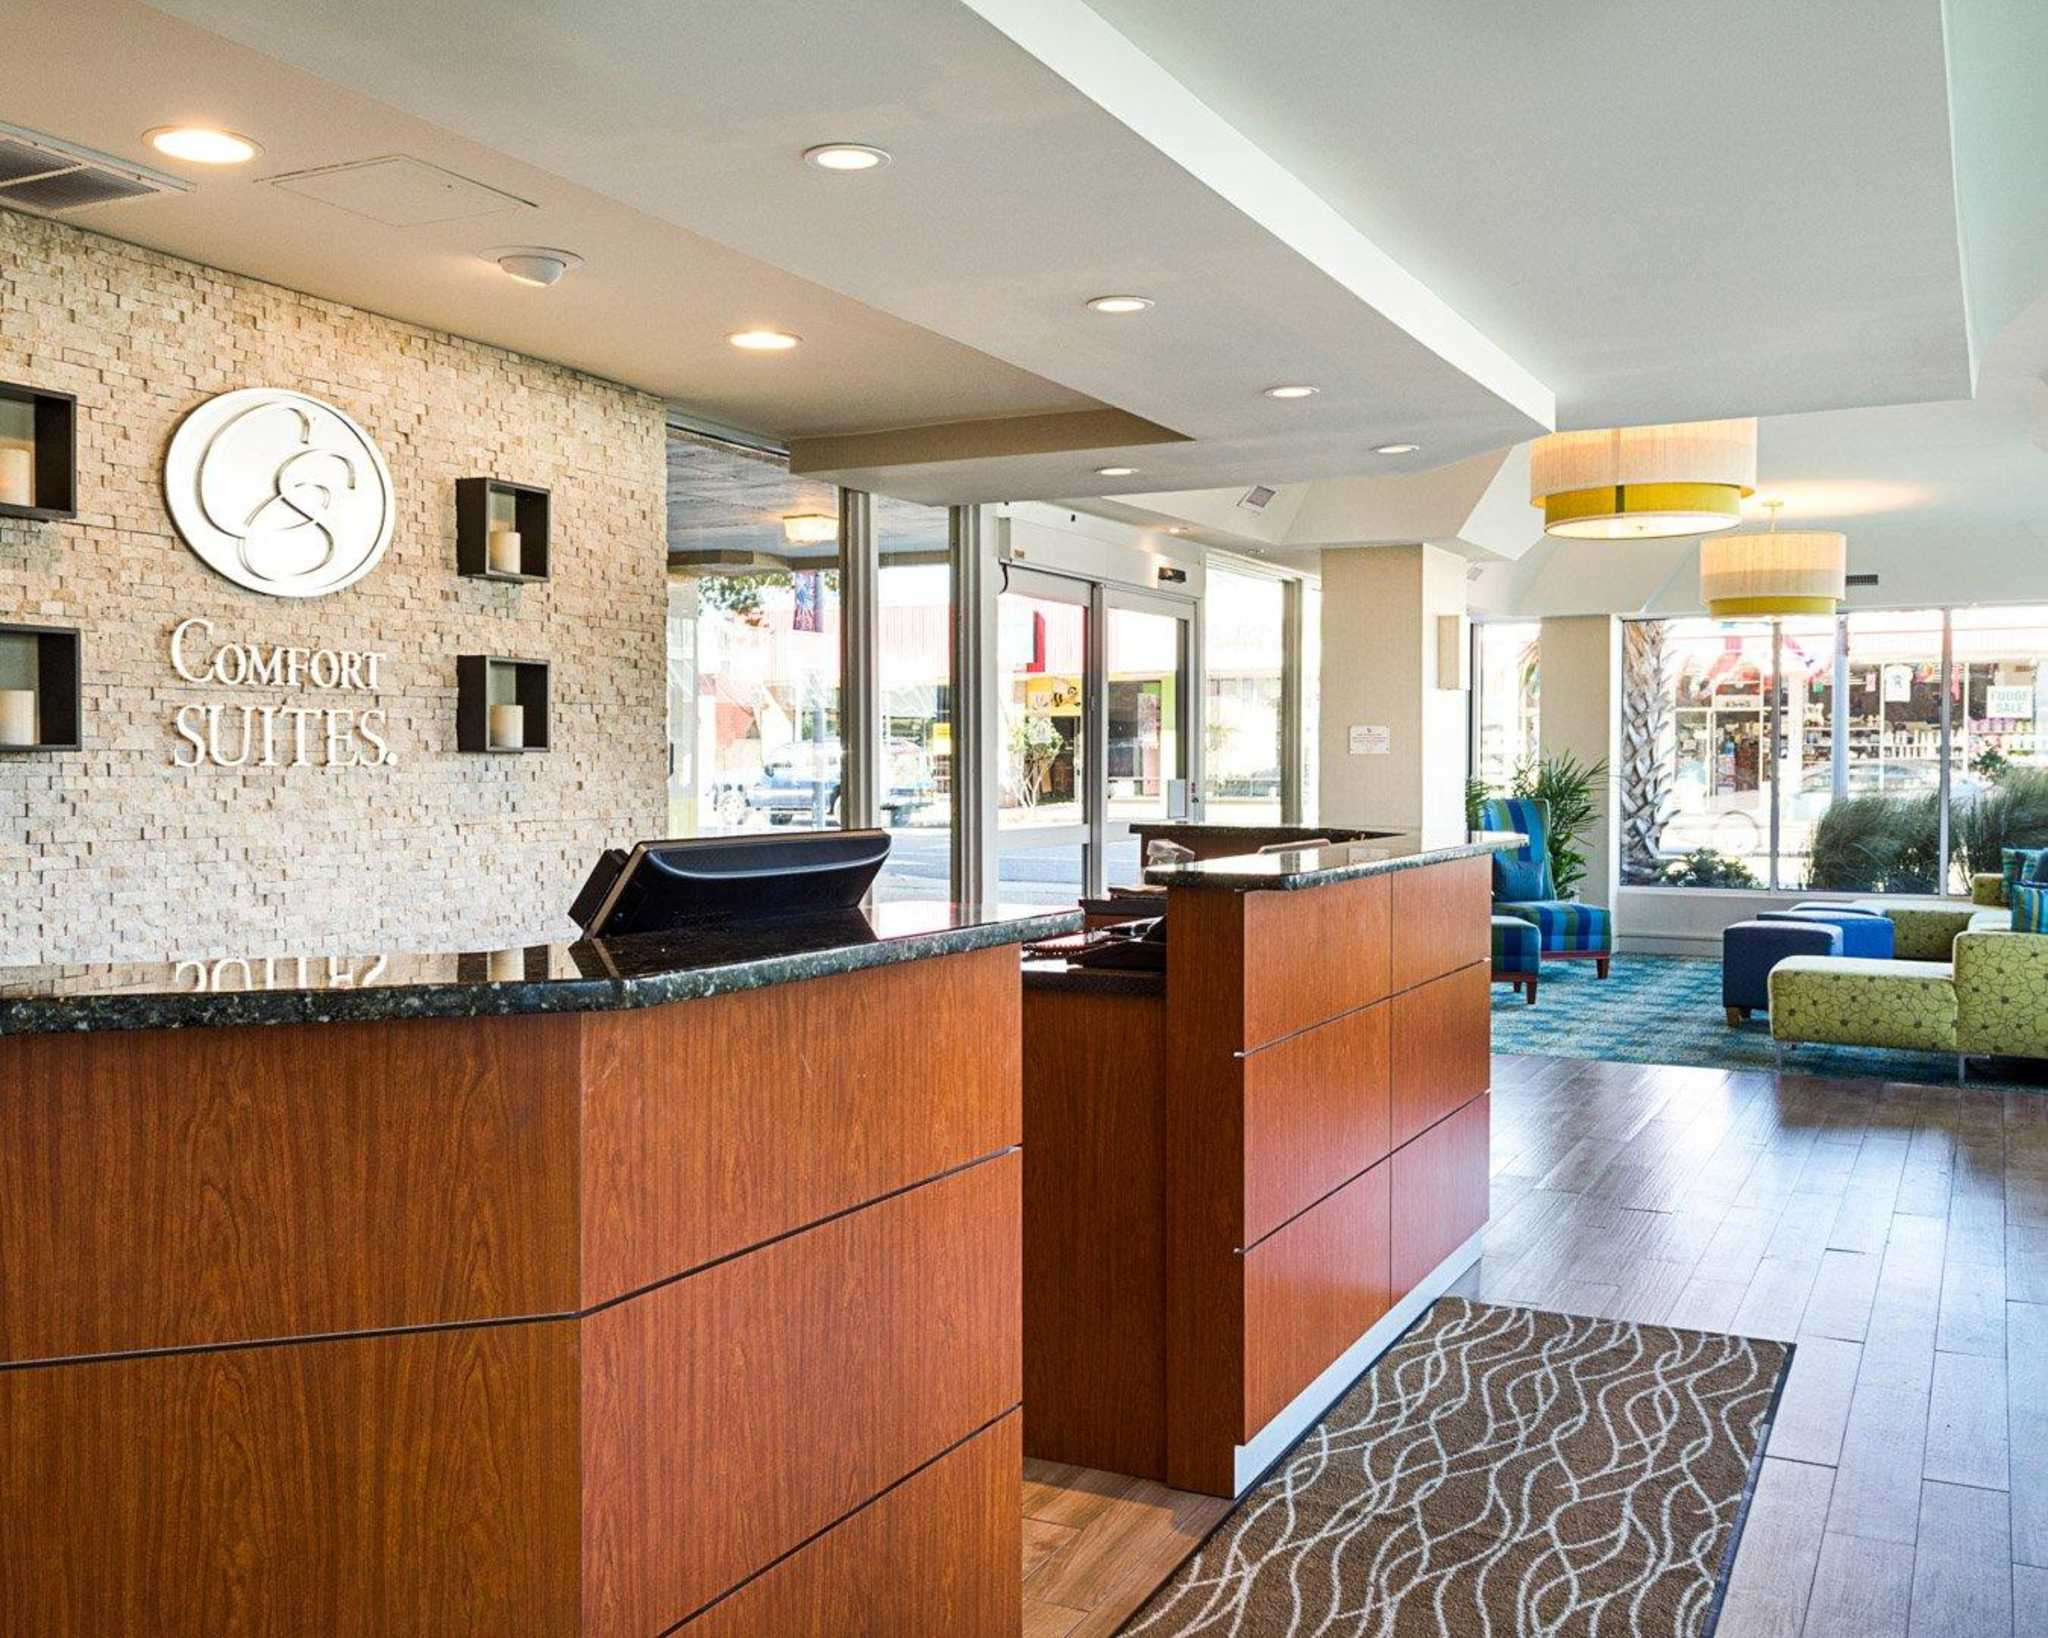 Comfort Suites Beachfront image 9